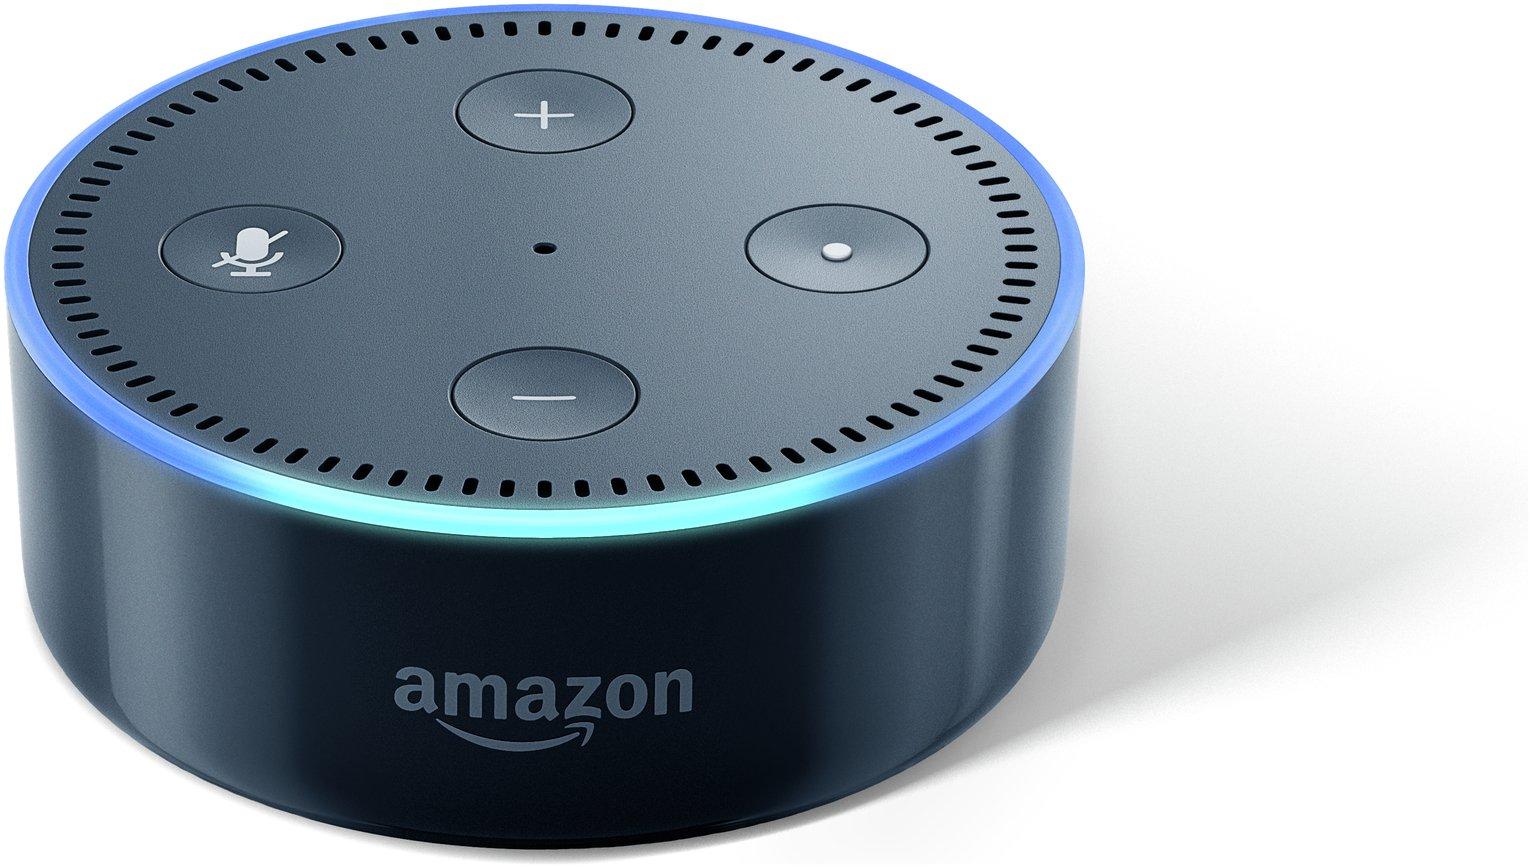 Amazon Echo Dot Multimedia Speaker - Black.